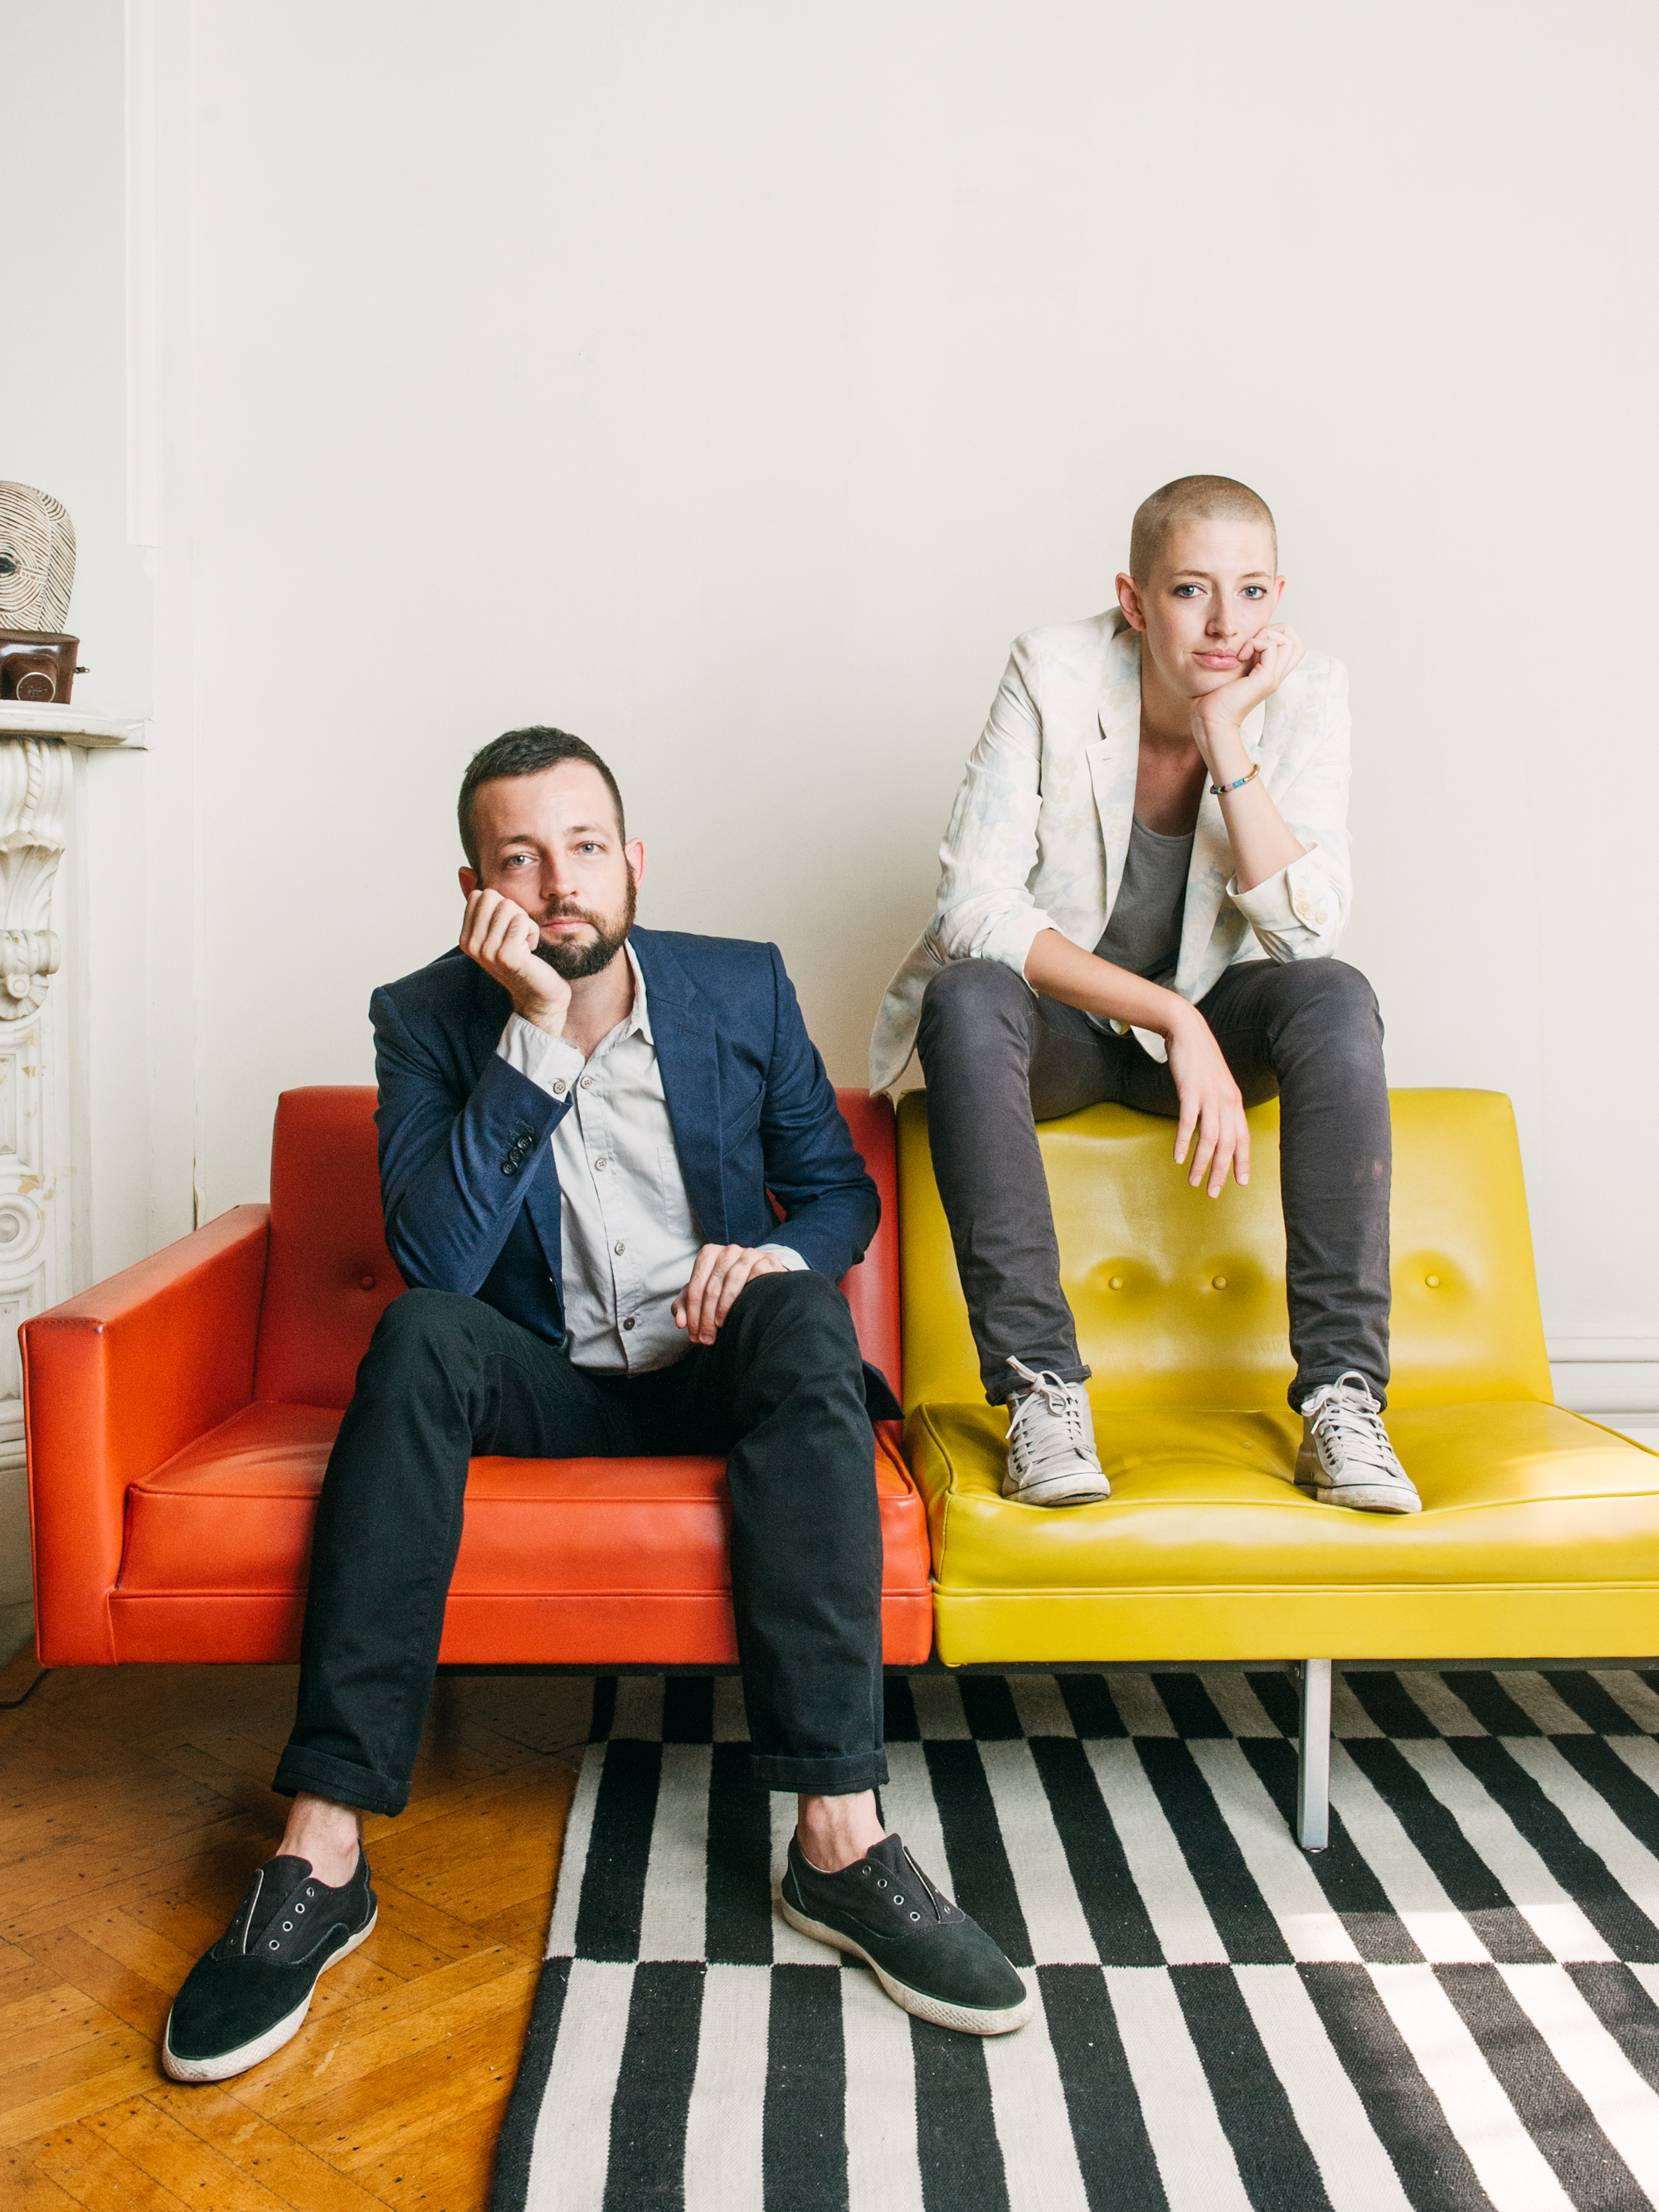 Max Freeman & Margaret Singer, creators of  The 3 Bits